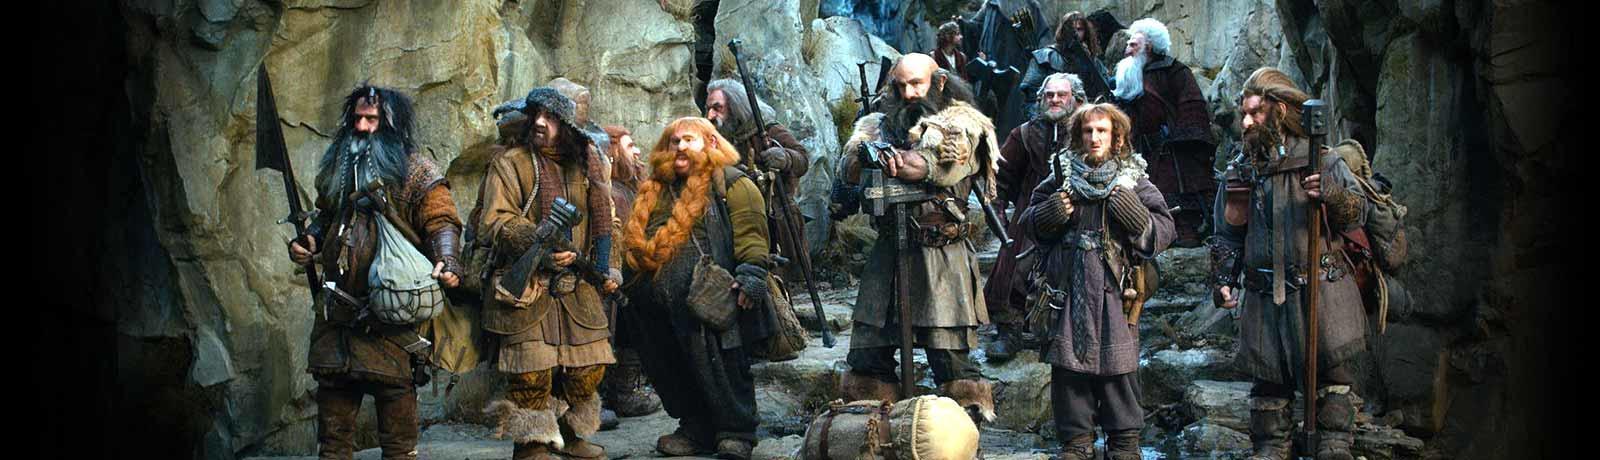 The Hobbit Movie Guide | Fandango